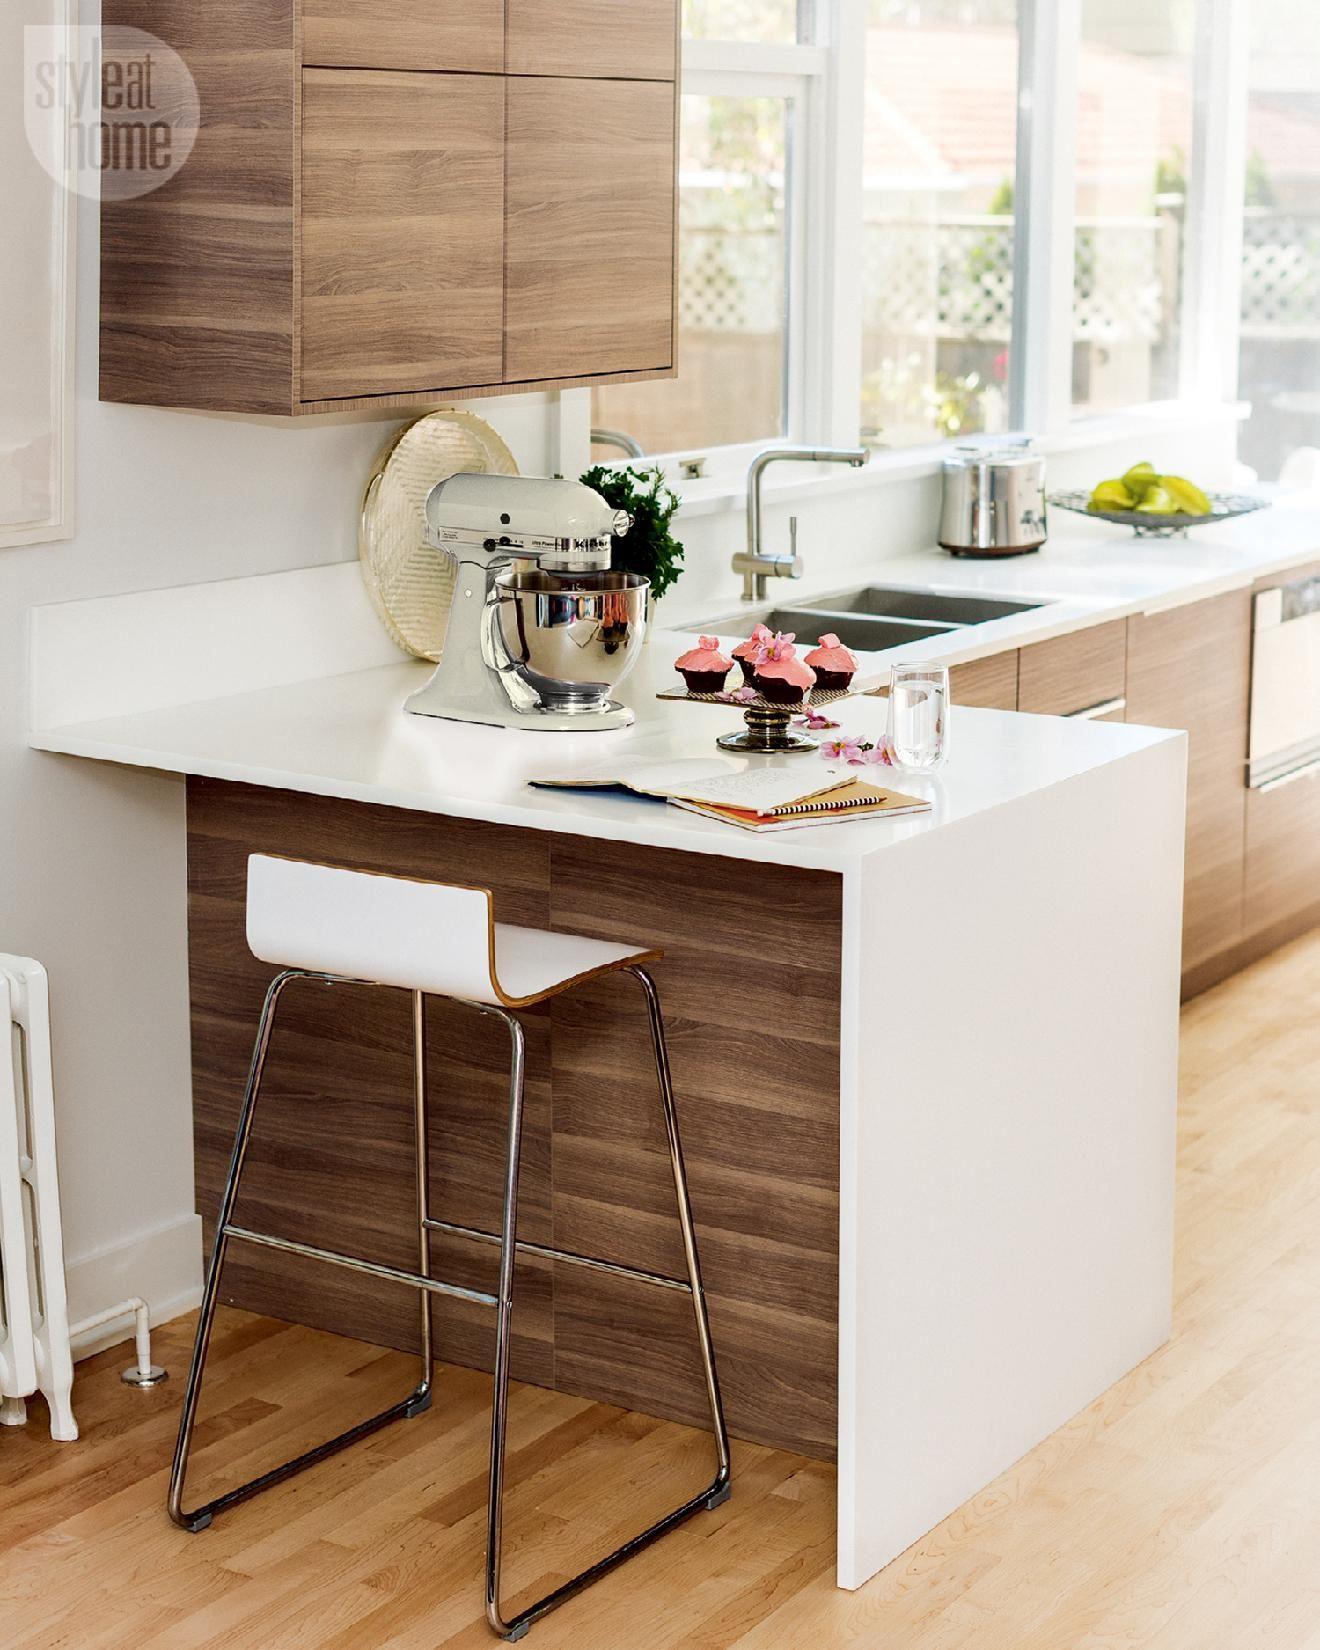 Kitchen Style At Home Kitchen Design Small Kitchen Remodel Small Kitchen Design